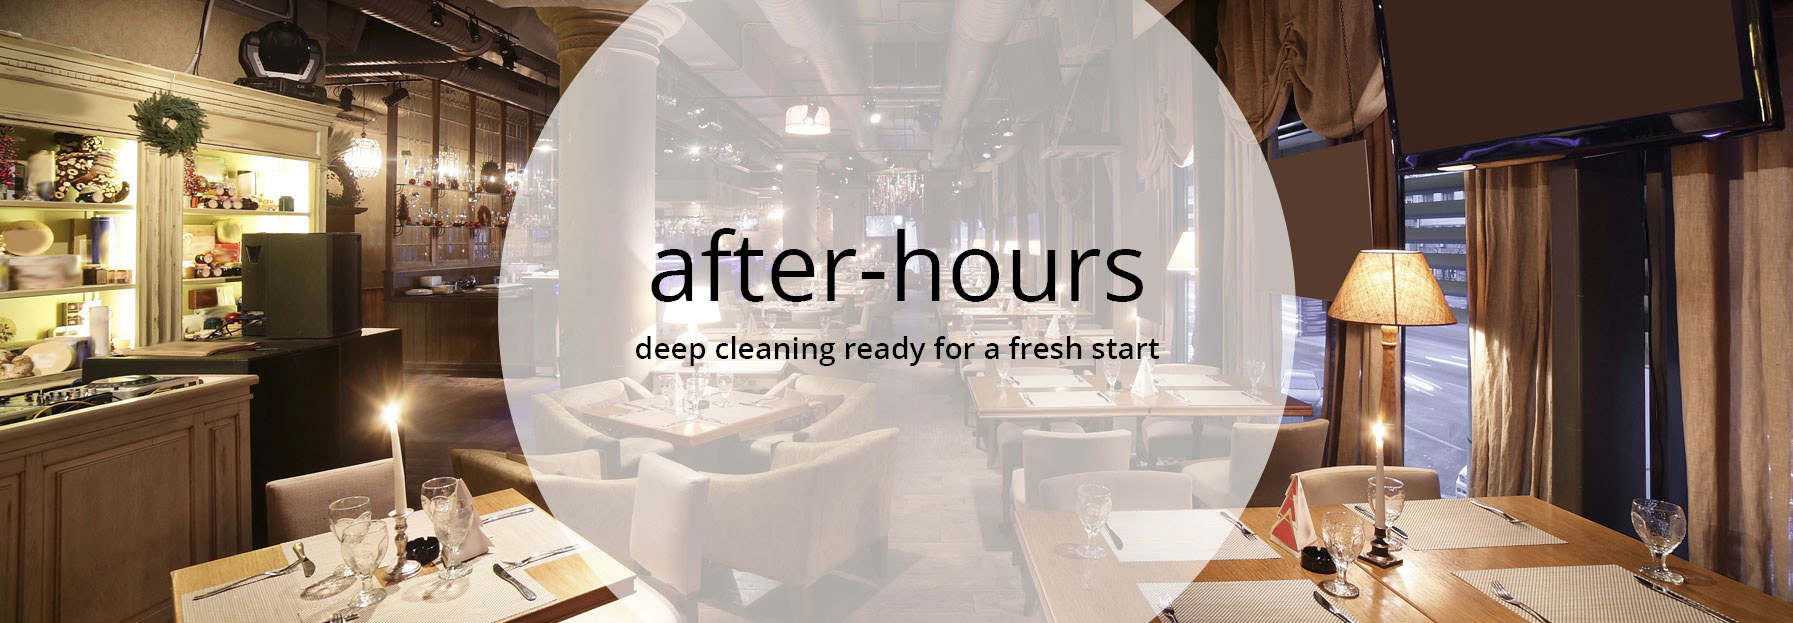 Restaurant Cleaning Services Expert Restaurant Cleaners For Eating - Restaurant table cleaner